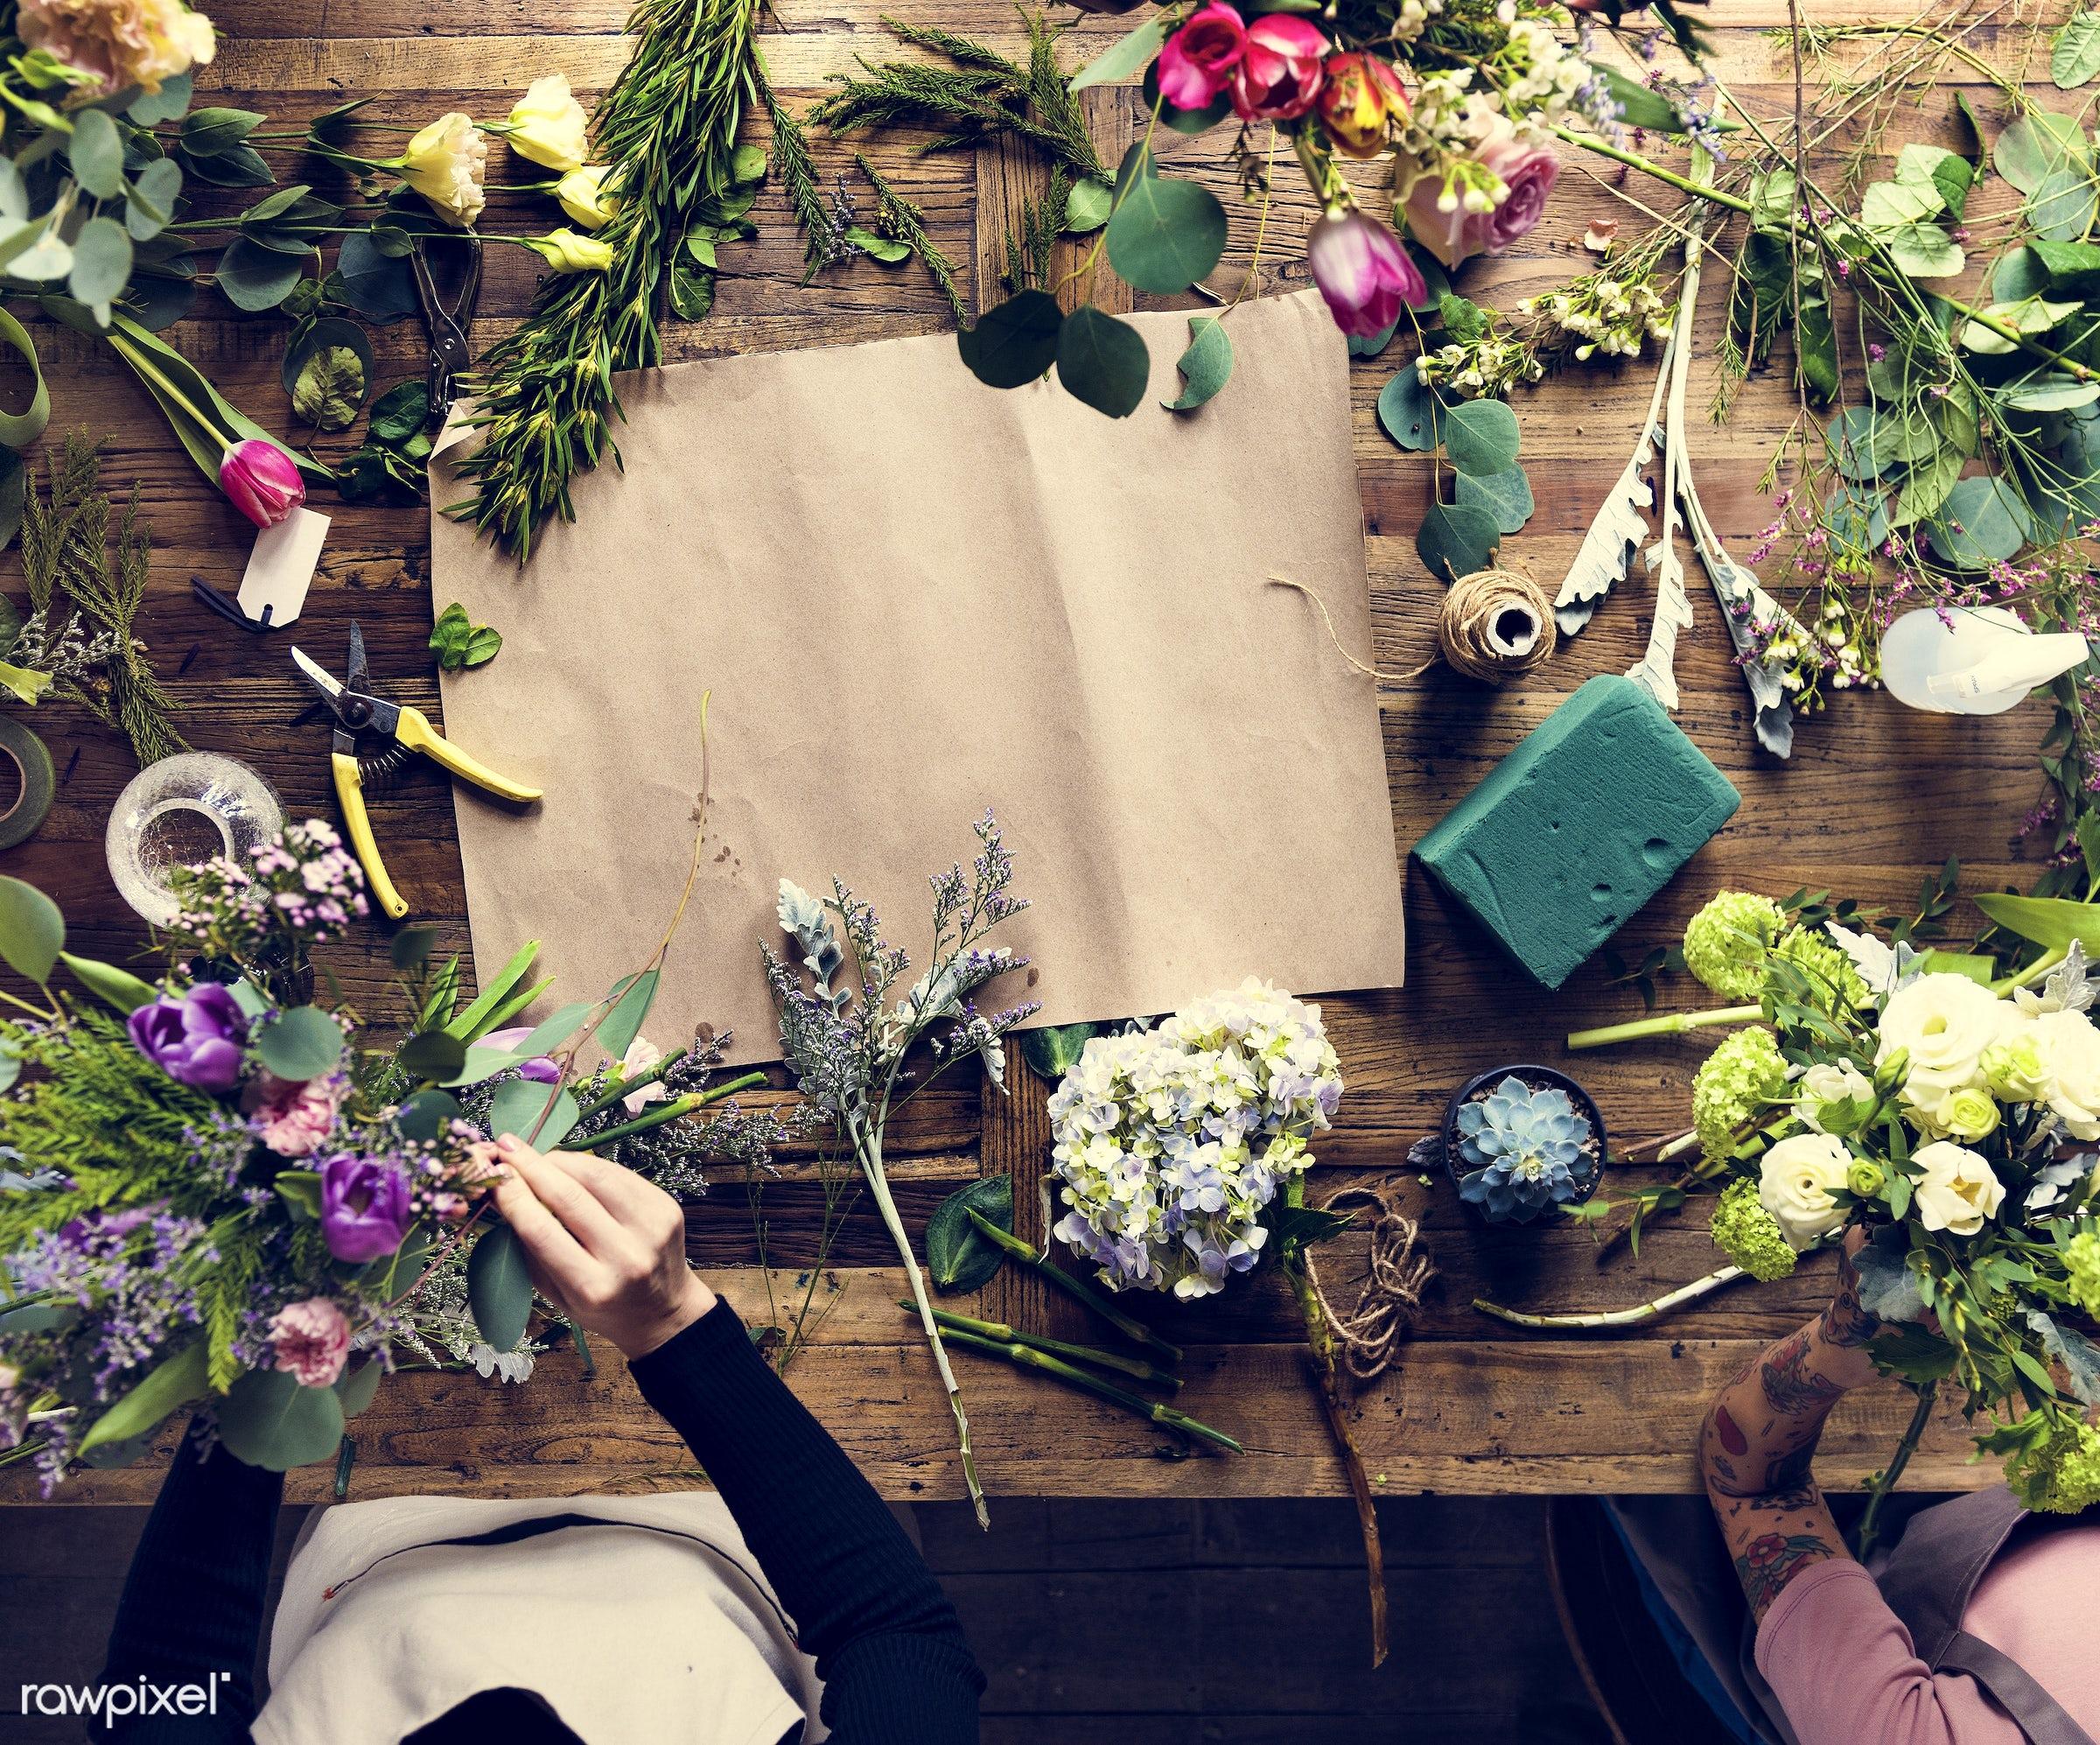 craft, handicraft, show, rustic, rope, nature, ribbon, empty, flowers, creative, art, carnation, hobby, table, florist,...